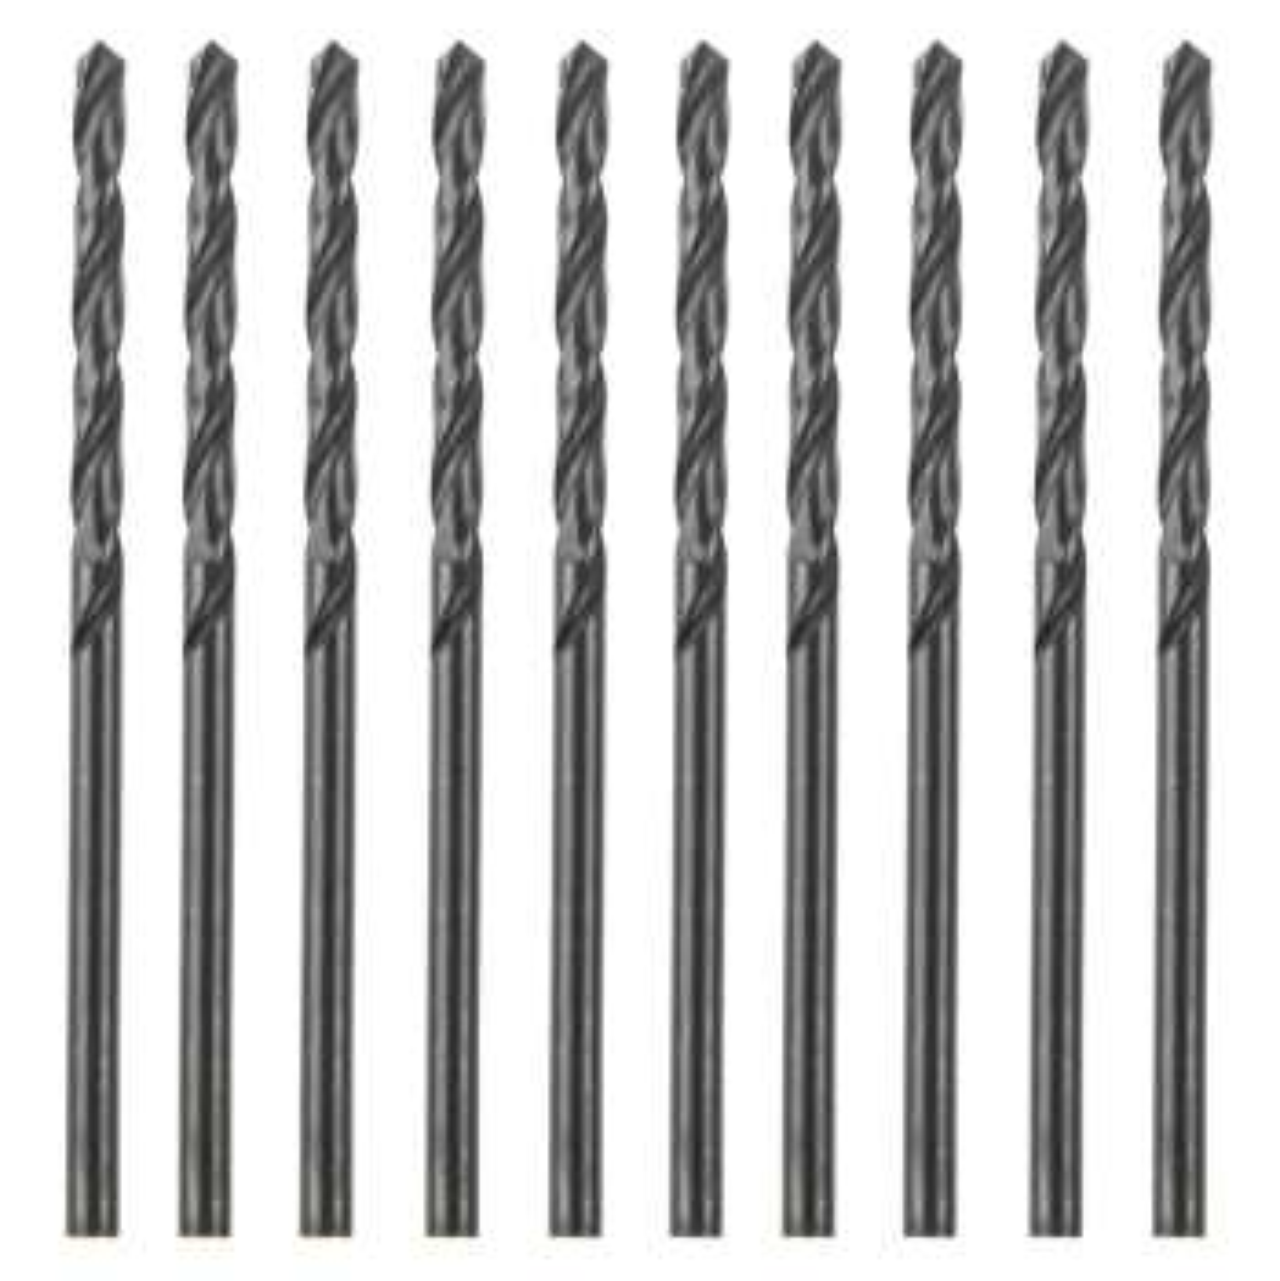 مجموعه 10 عددی مته فلز دیوالت مدل DT5116-QZ